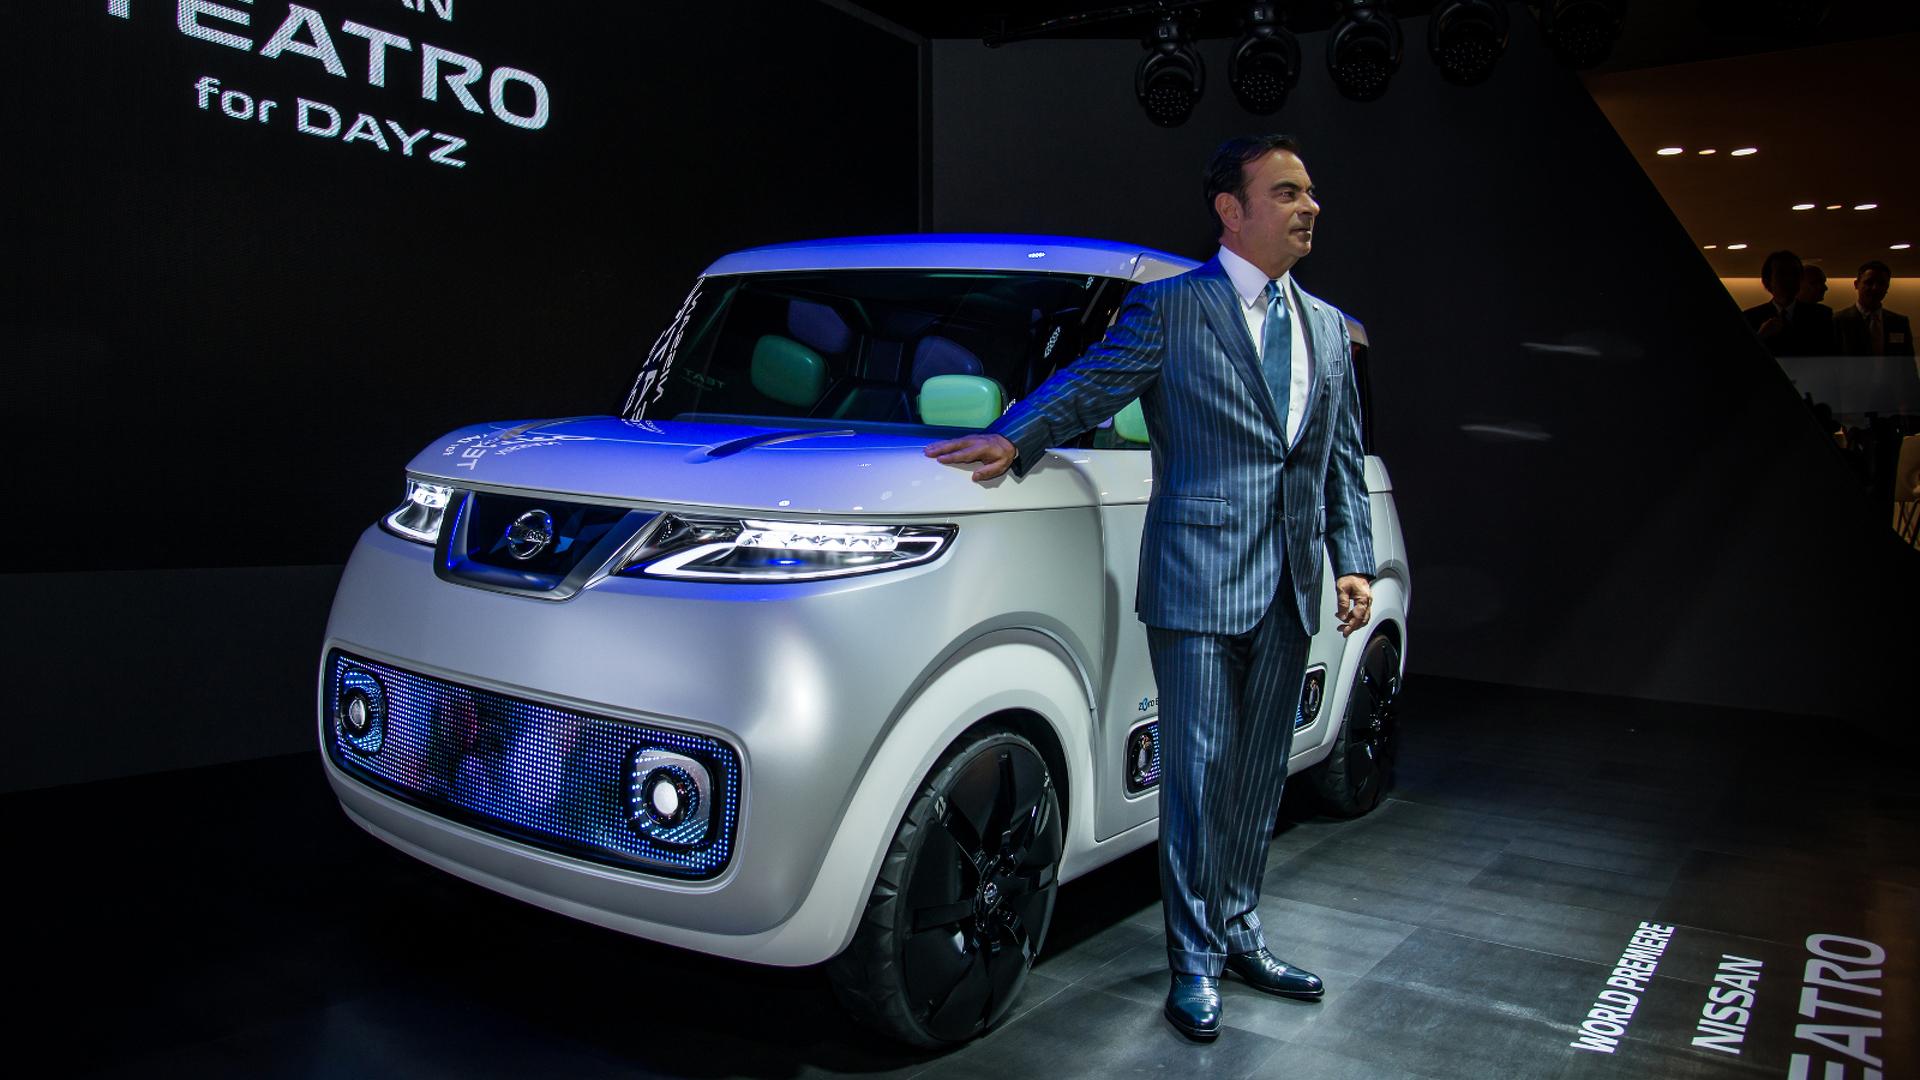 Nissan Teatro for Dayz concept arrives in Tokyo